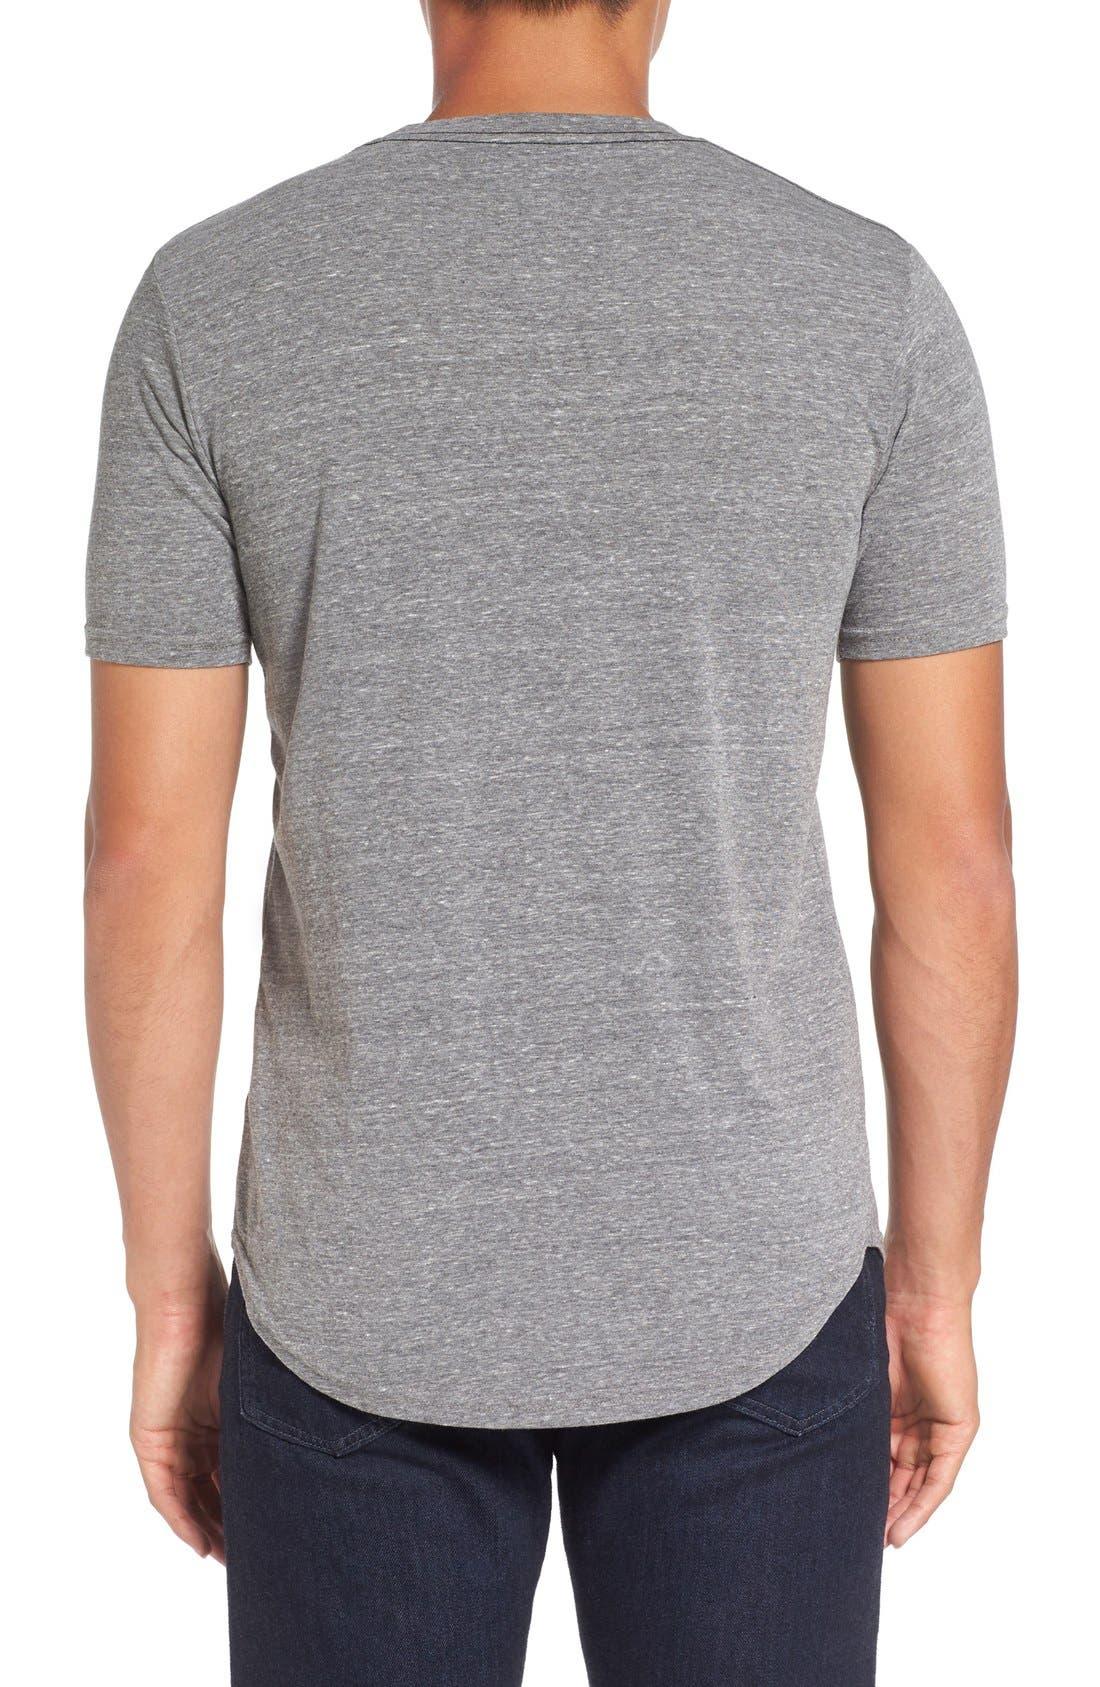 Triblend Scallop Crewneck T-Shirt,                             Alternate thumbnail 2, color,                             Heather Grey